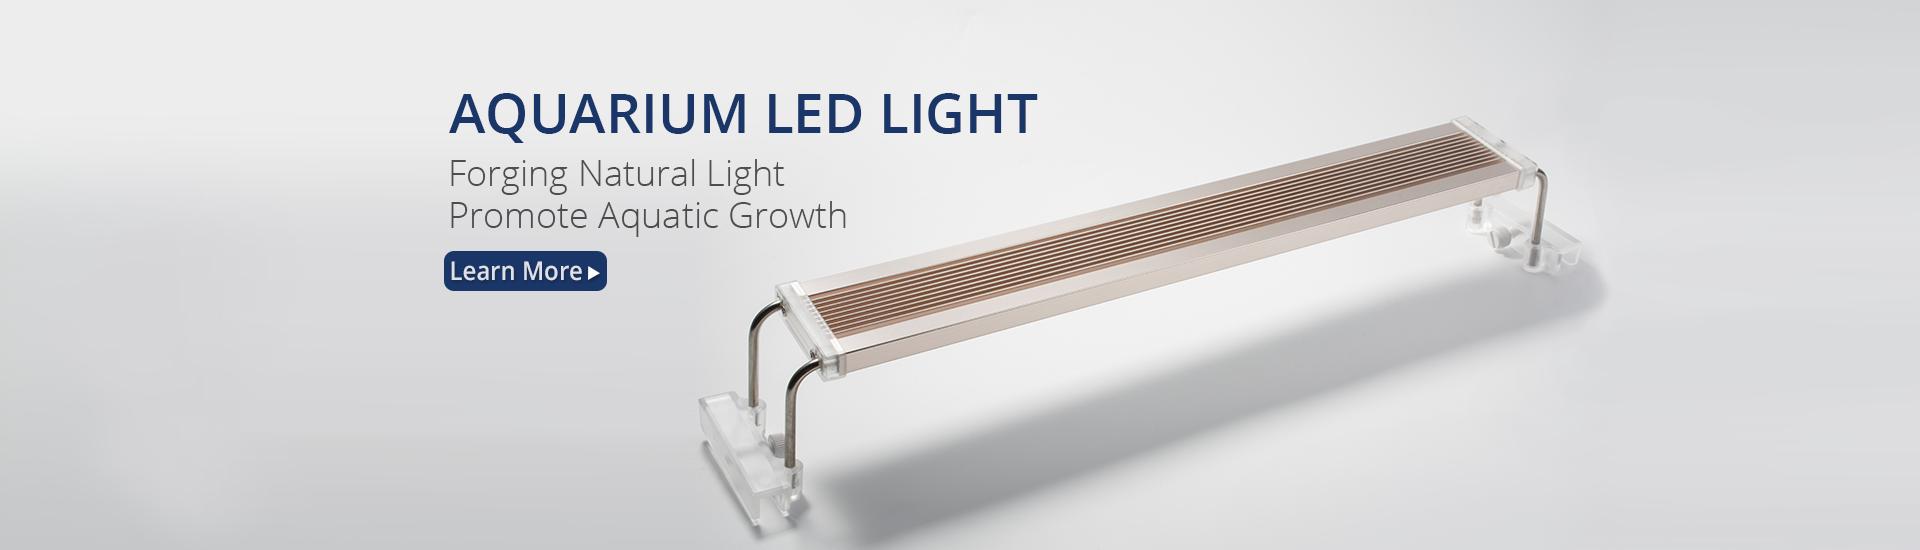 Fullsize Of Affordable Quality Lighting